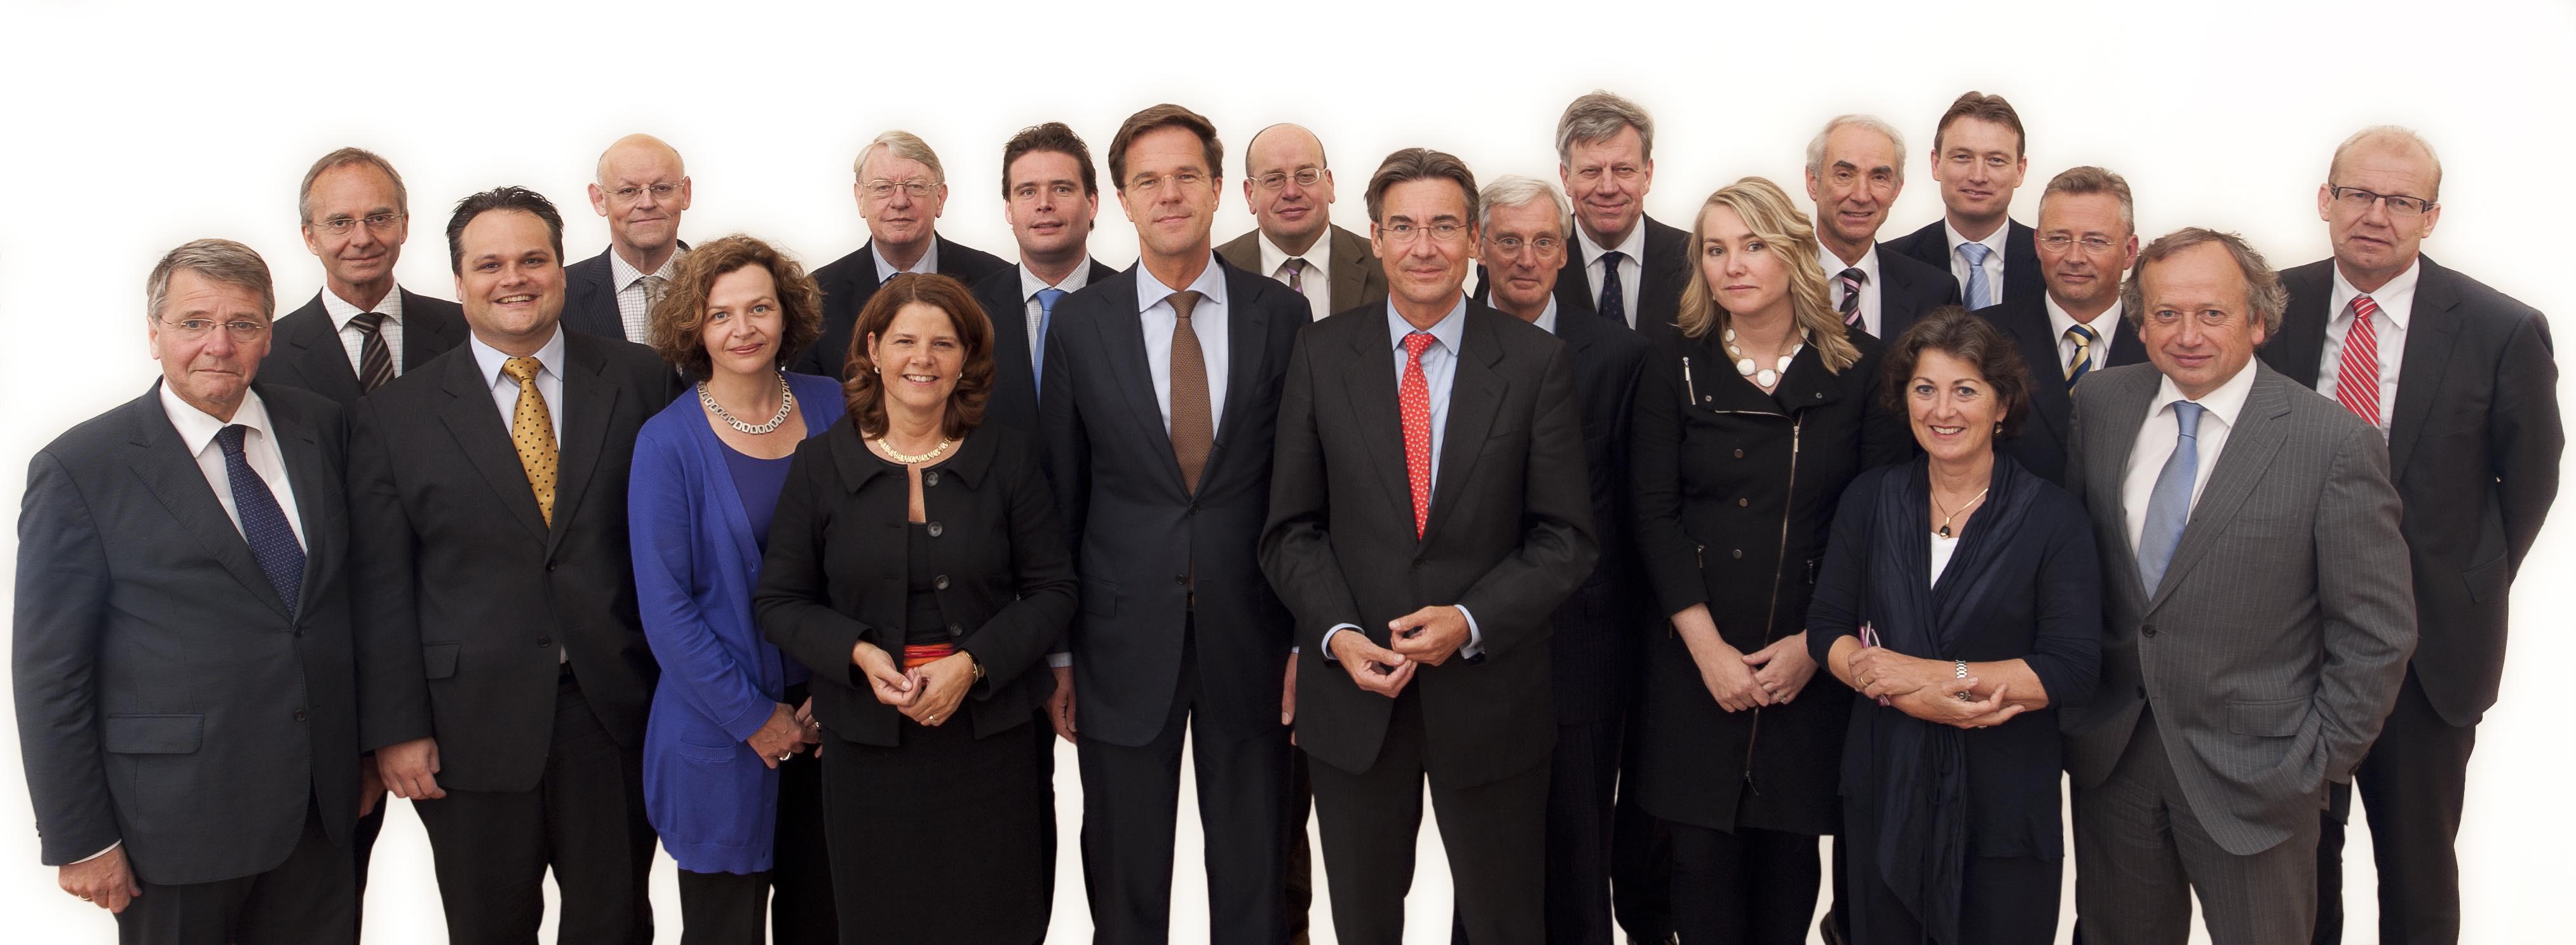 olanda guvern